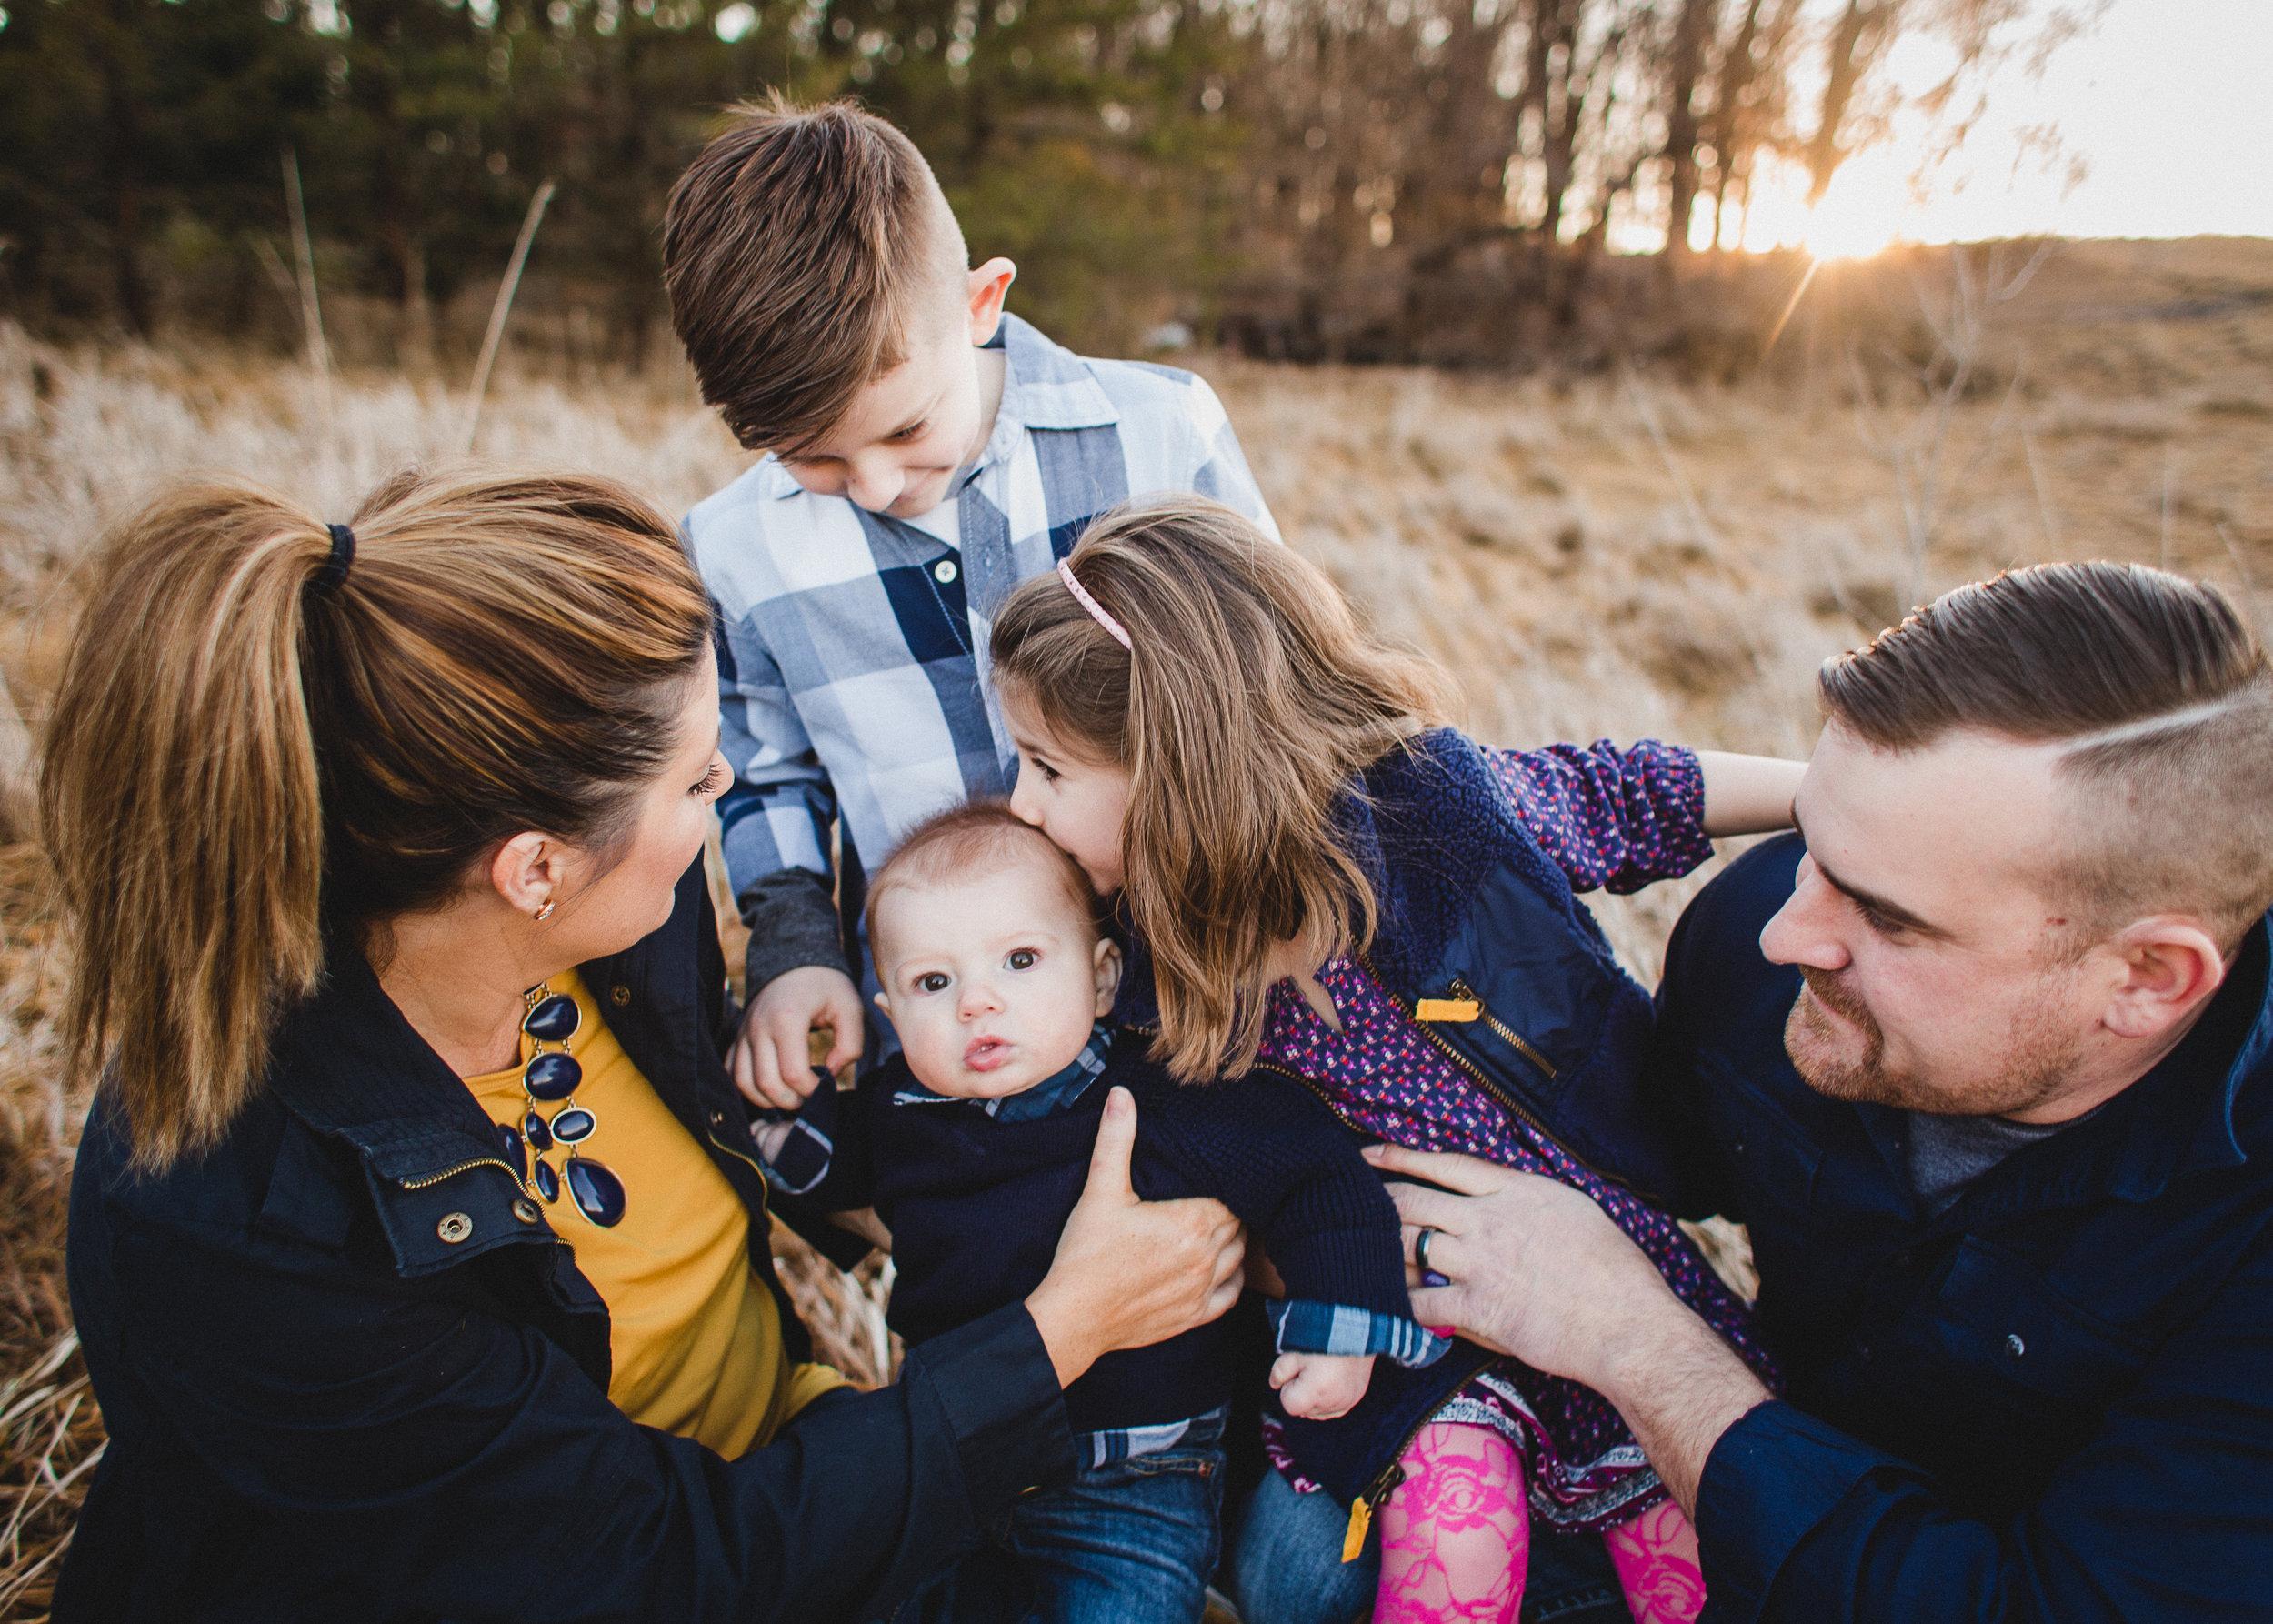 THE KUHR FAMILY / FAMILY